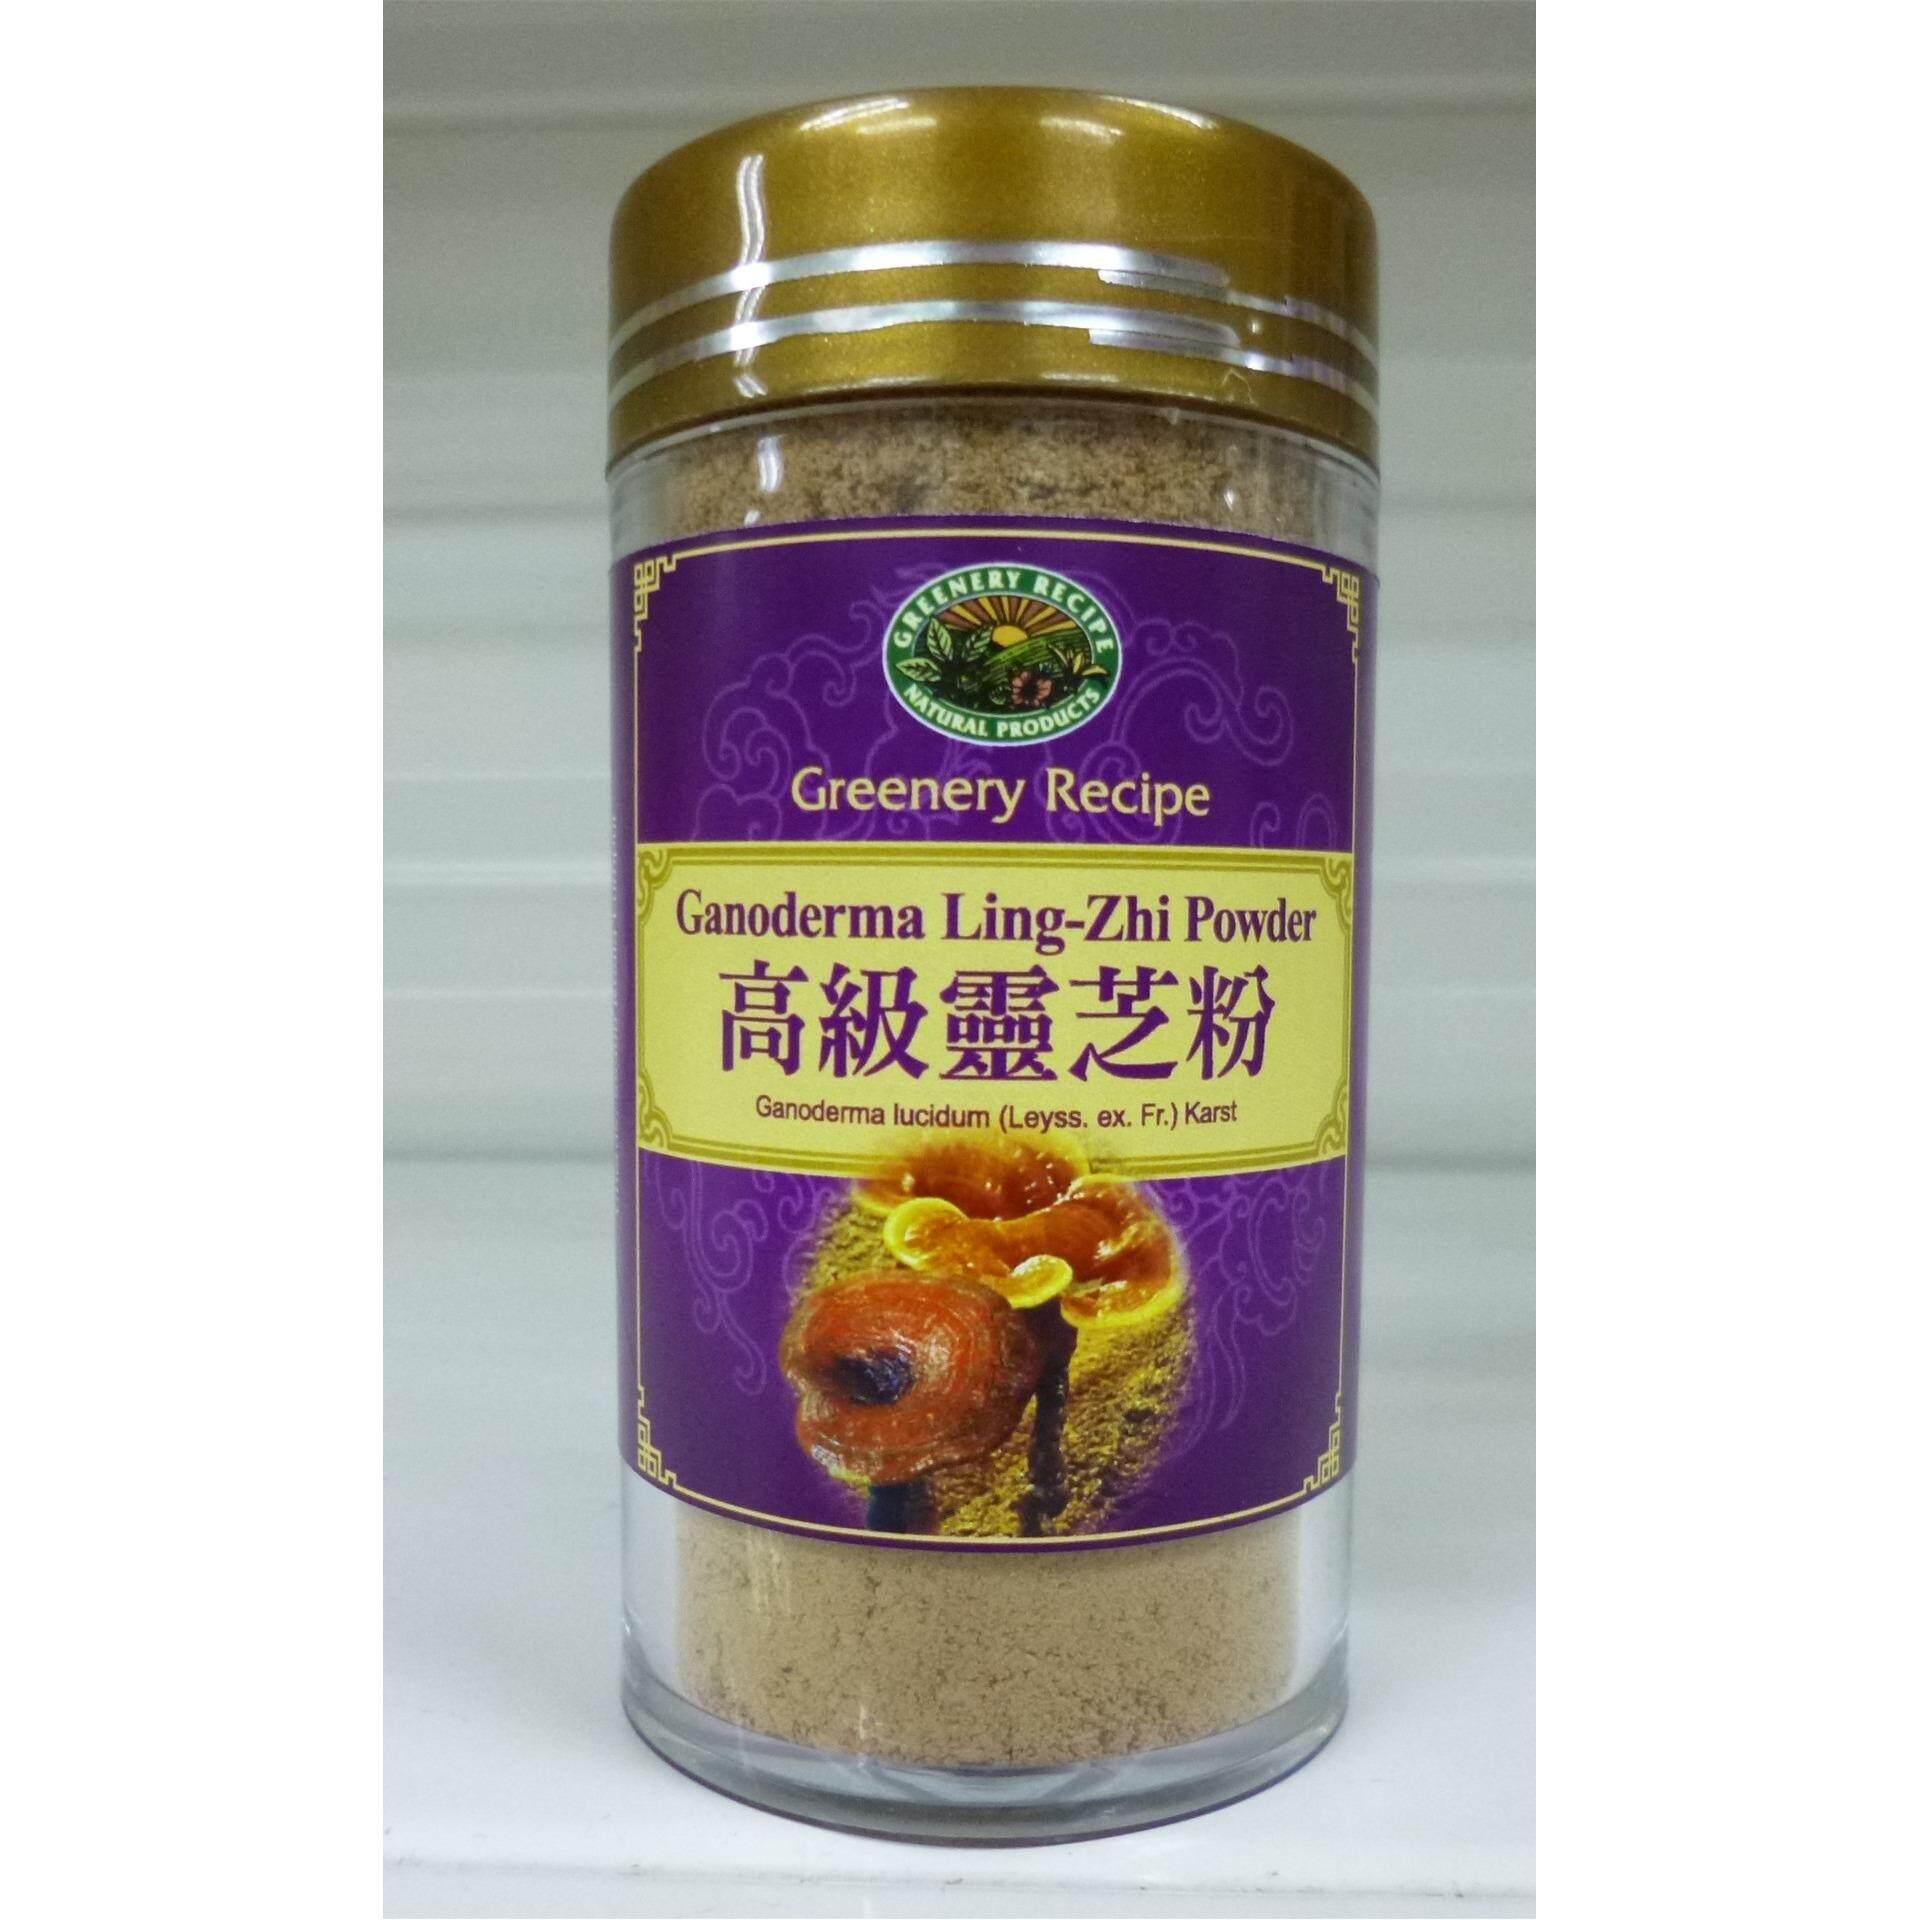 Ganoderma PowderTonifying Qi & Tranquilize